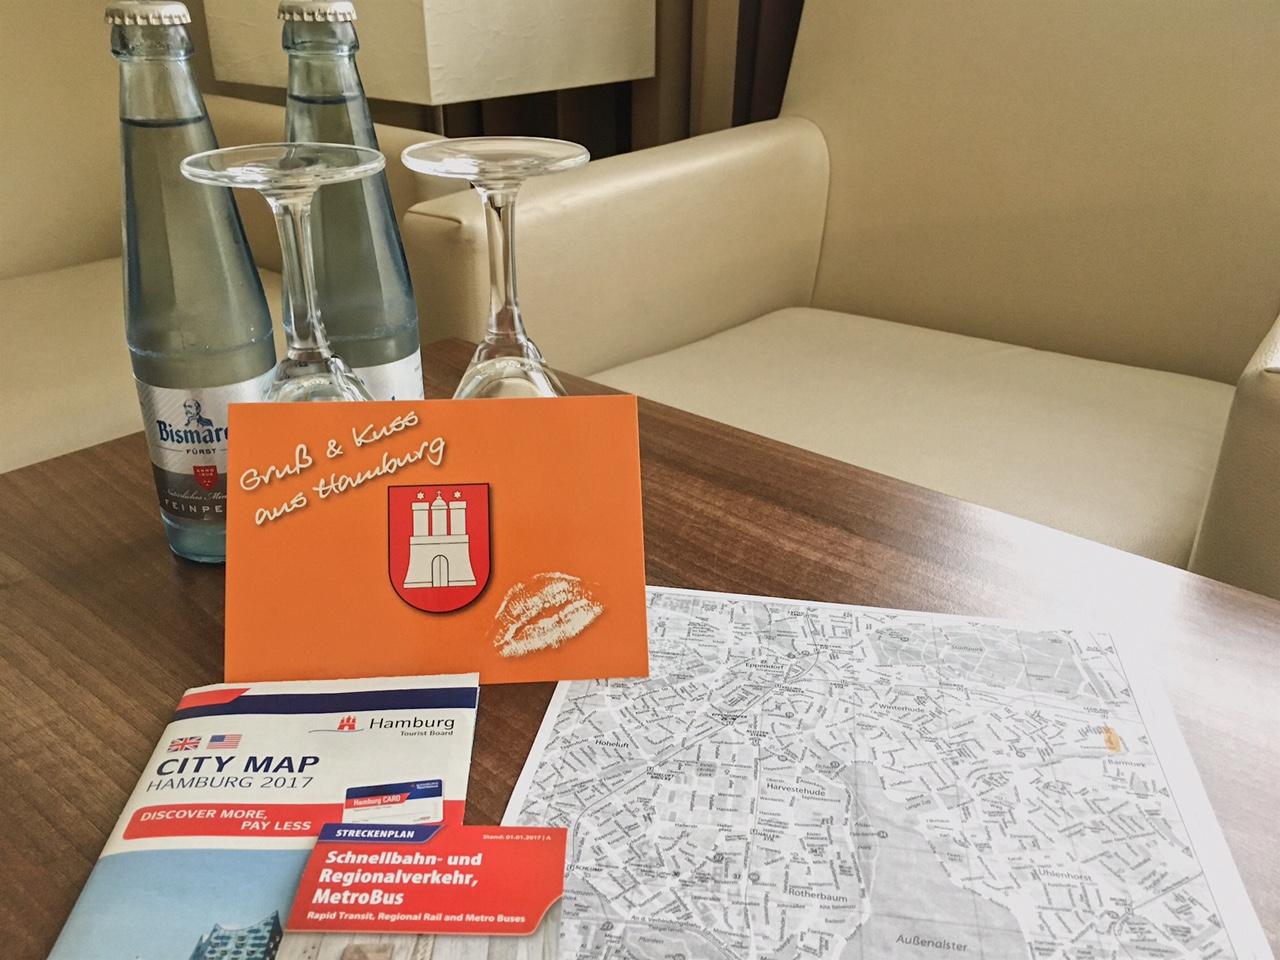 Hamburg hotel - Hotel Am Stadtpark: a warm welcome - maps, postcard, water